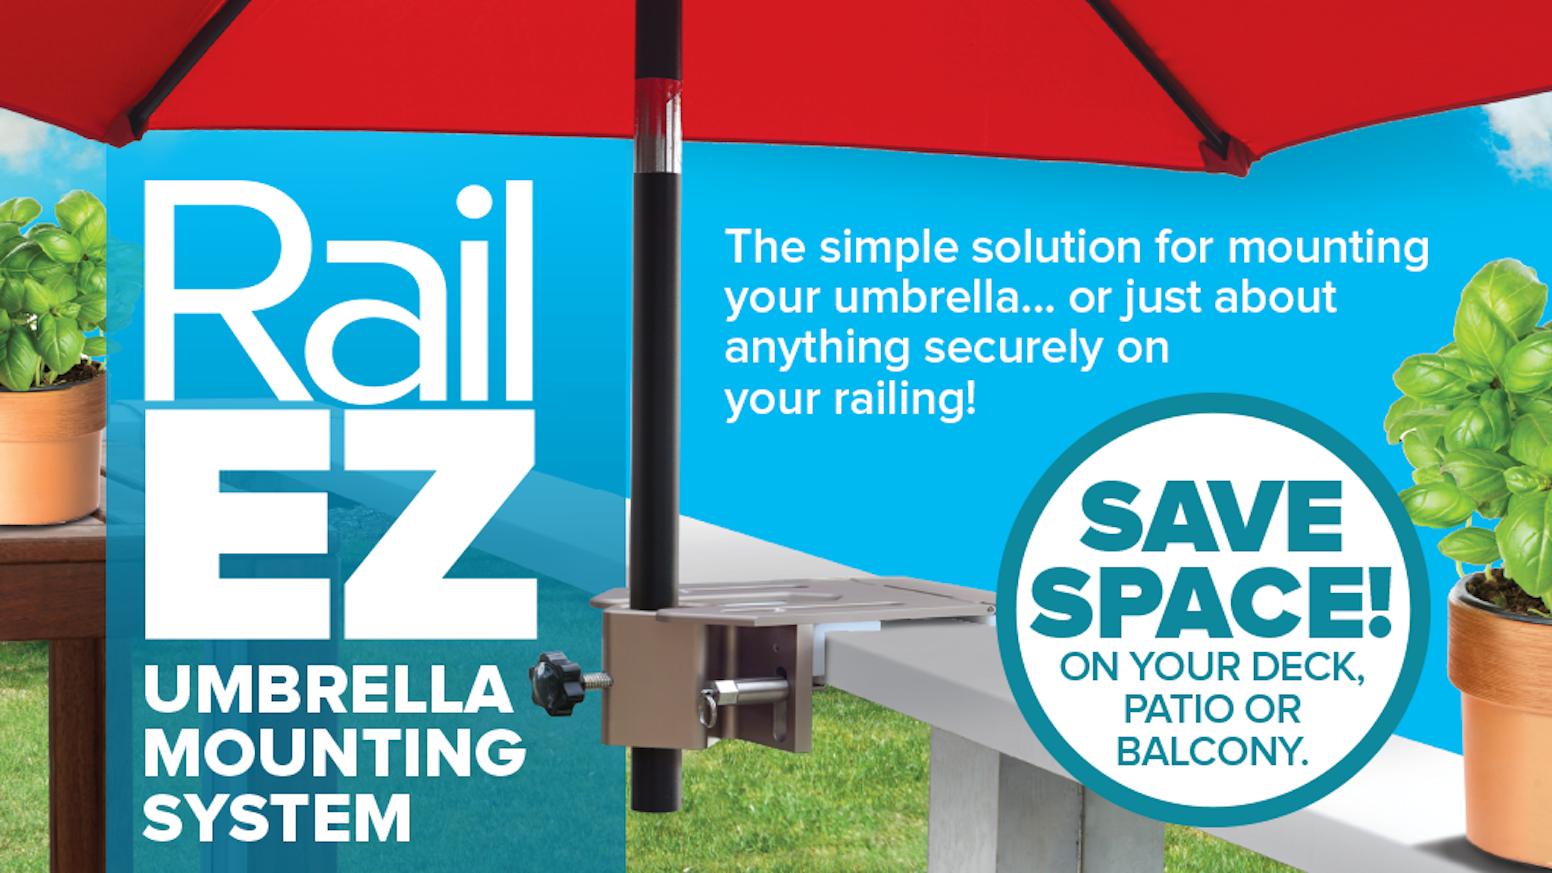 The Rail-EZ Umbrella Mounting System